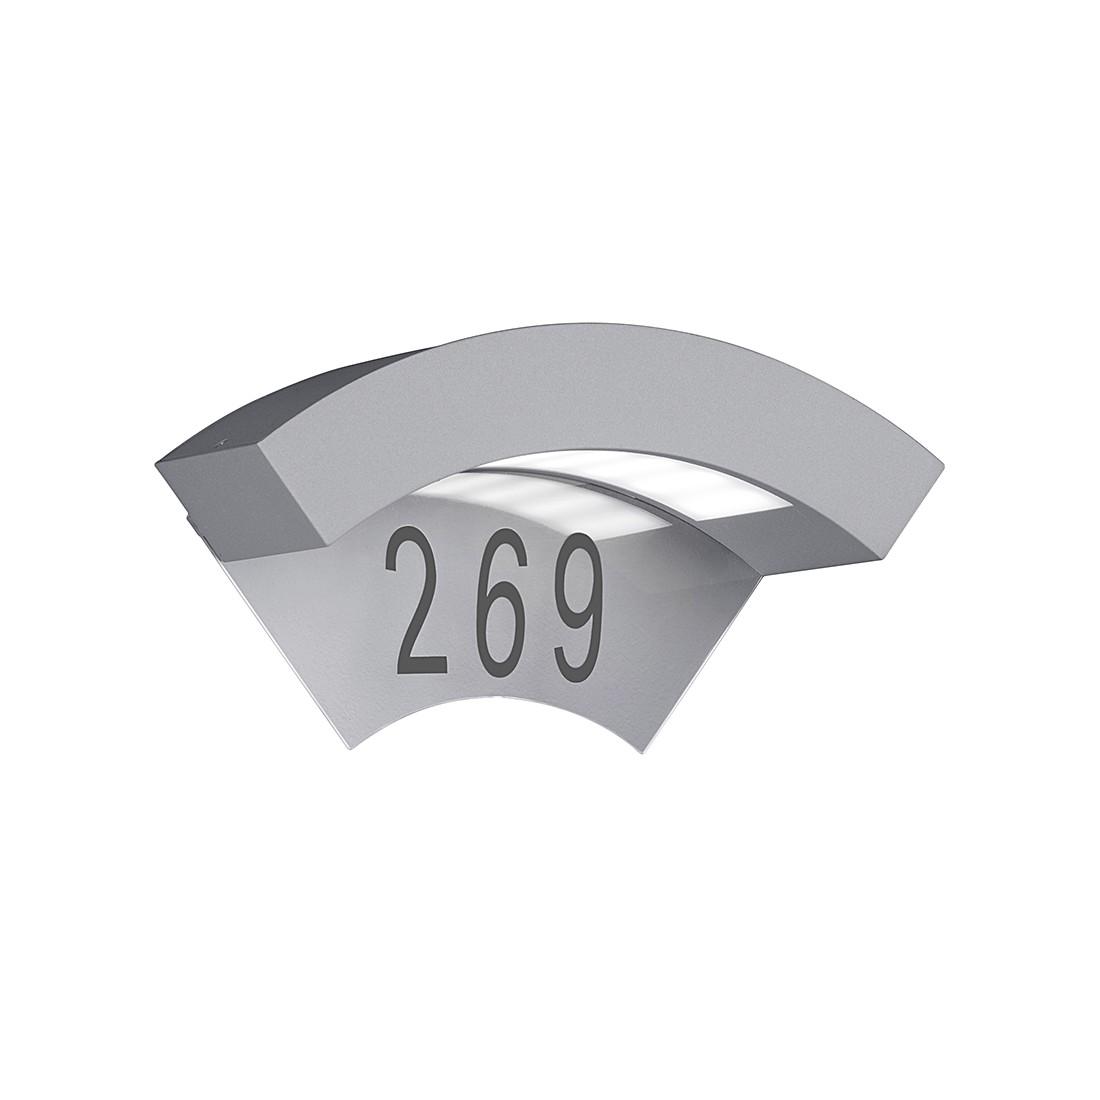 EEK A+, LED-Außenleuchte Moskwa 1-flammig - Aluminium Kunststoff - Silber, Trio